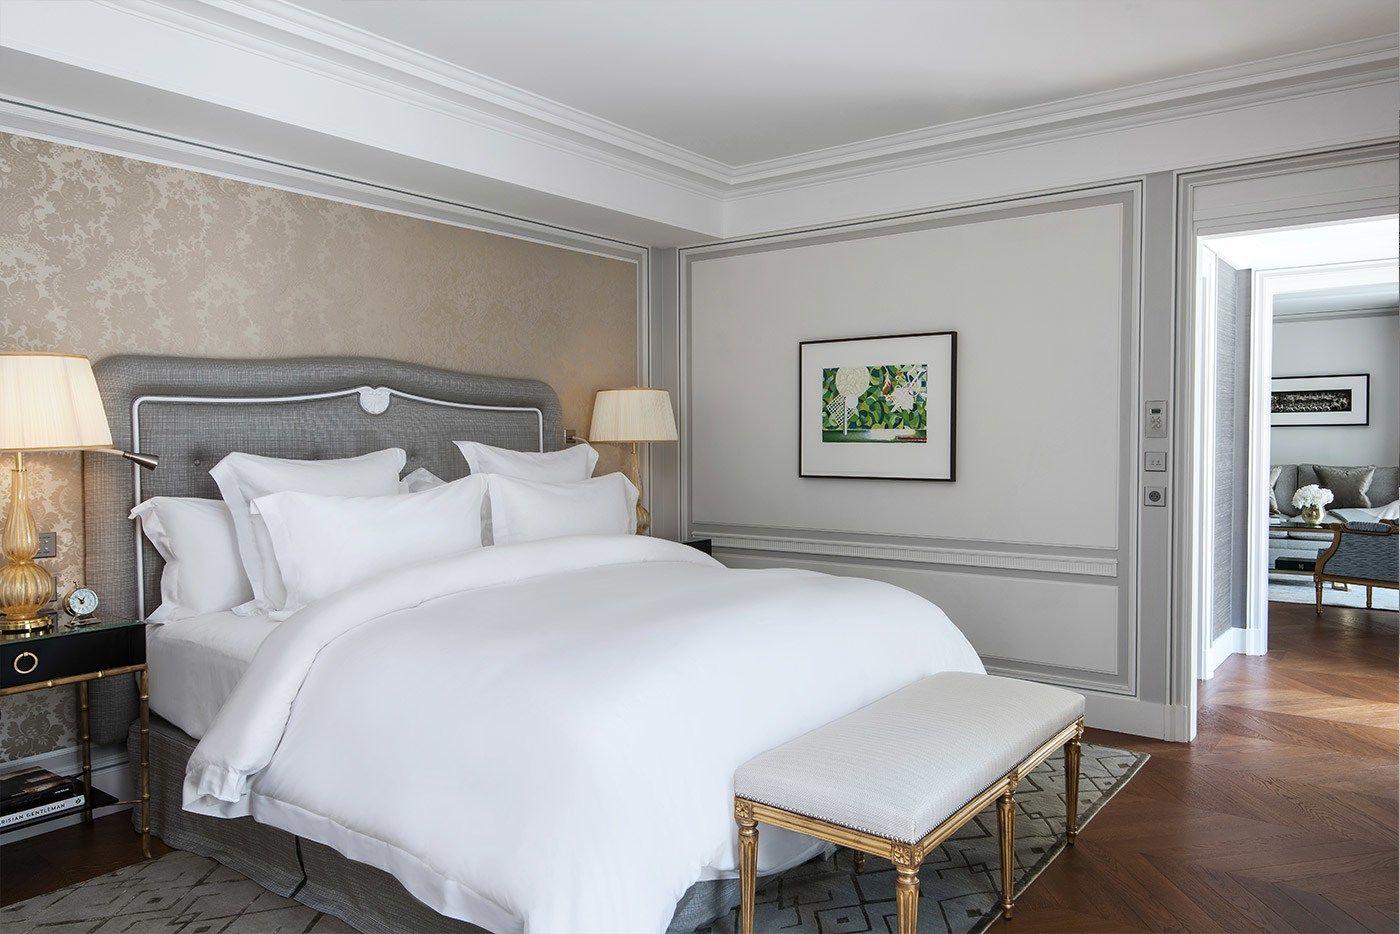 Gallery Hôtel de Crillon, A Rosewood Hotel Rosewood